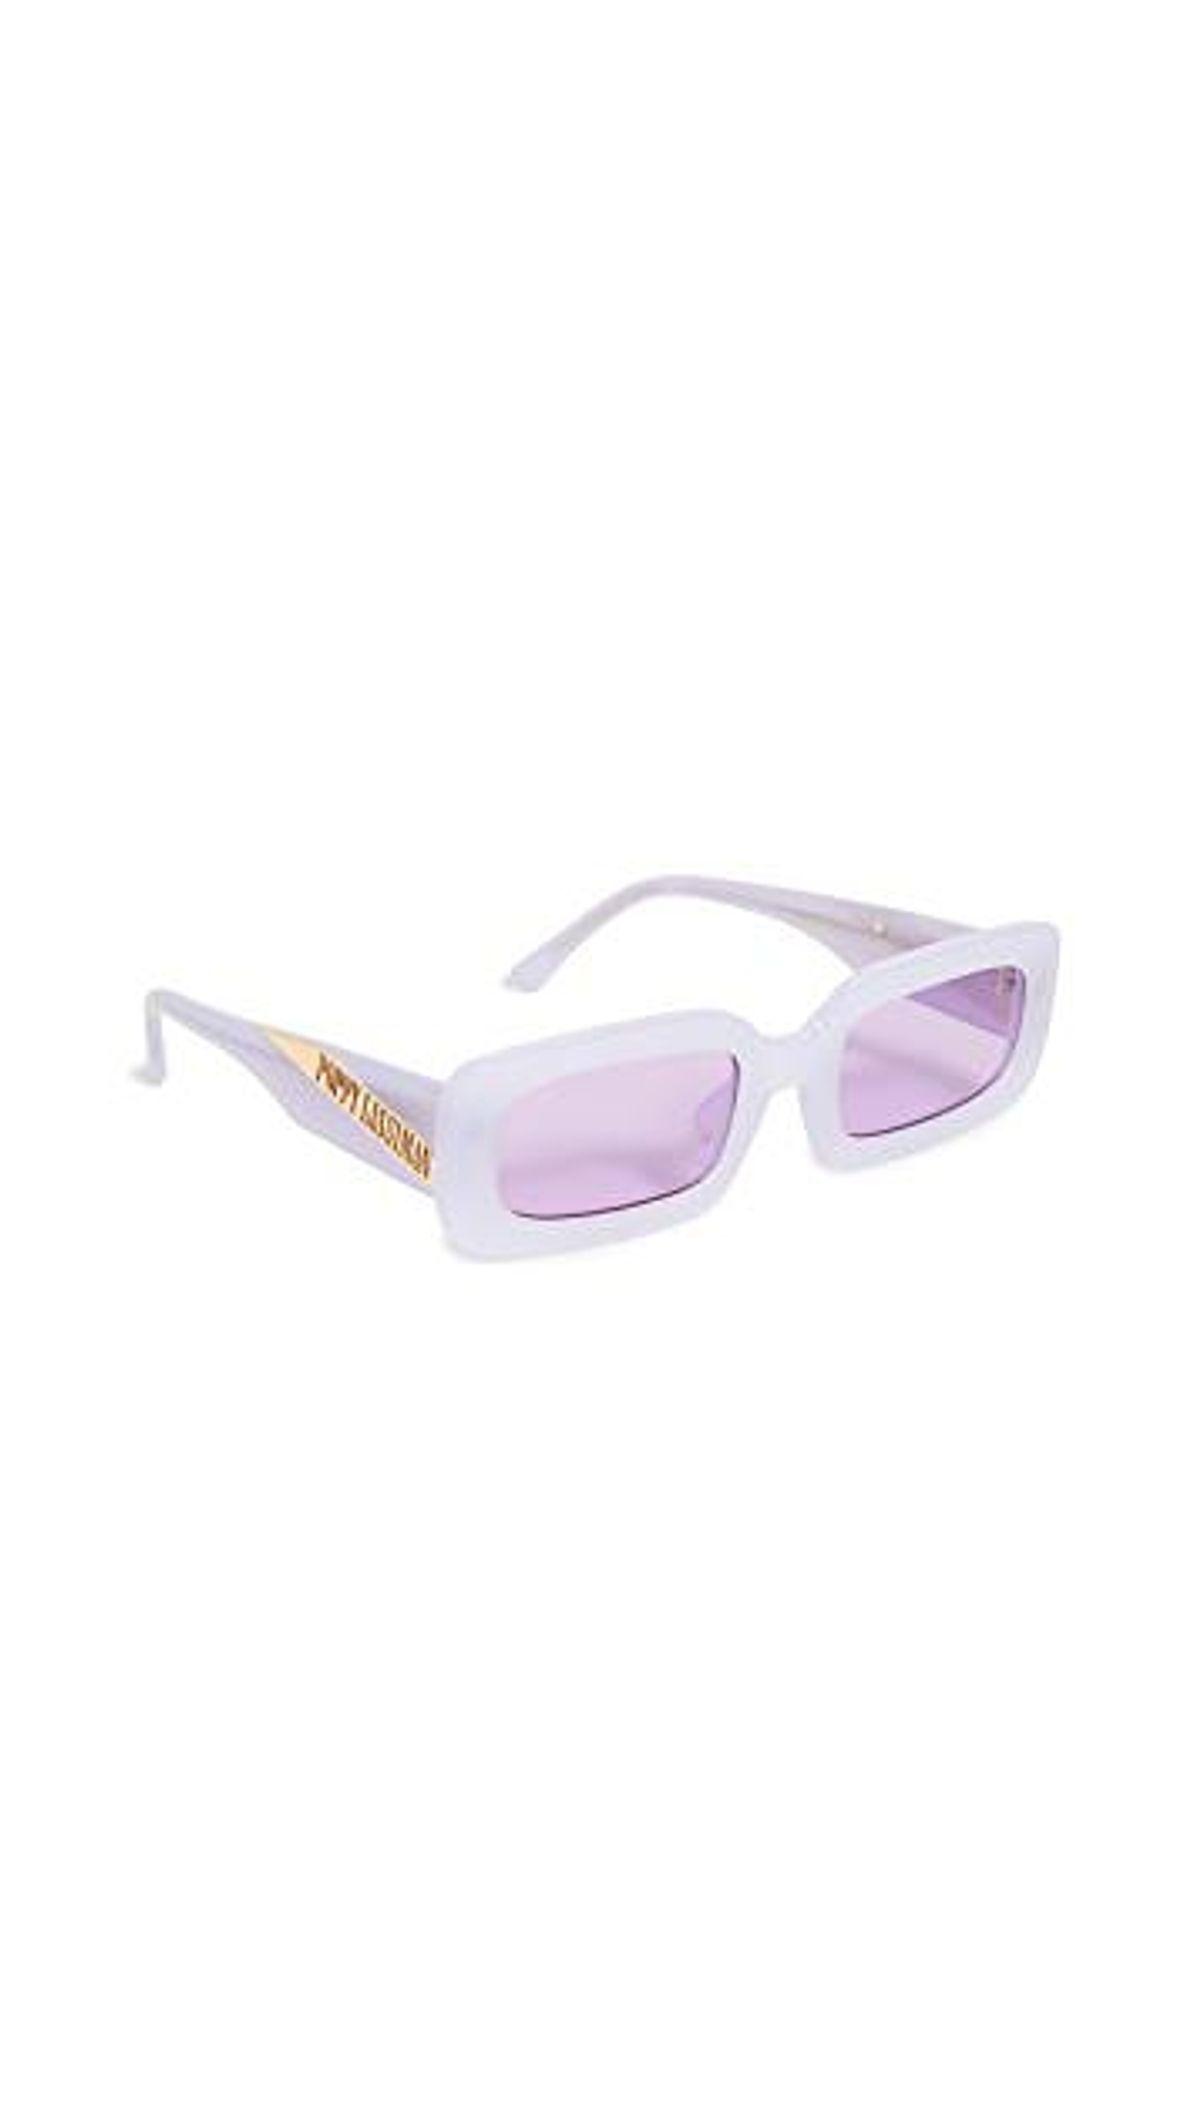 Marteeni Sunglasses